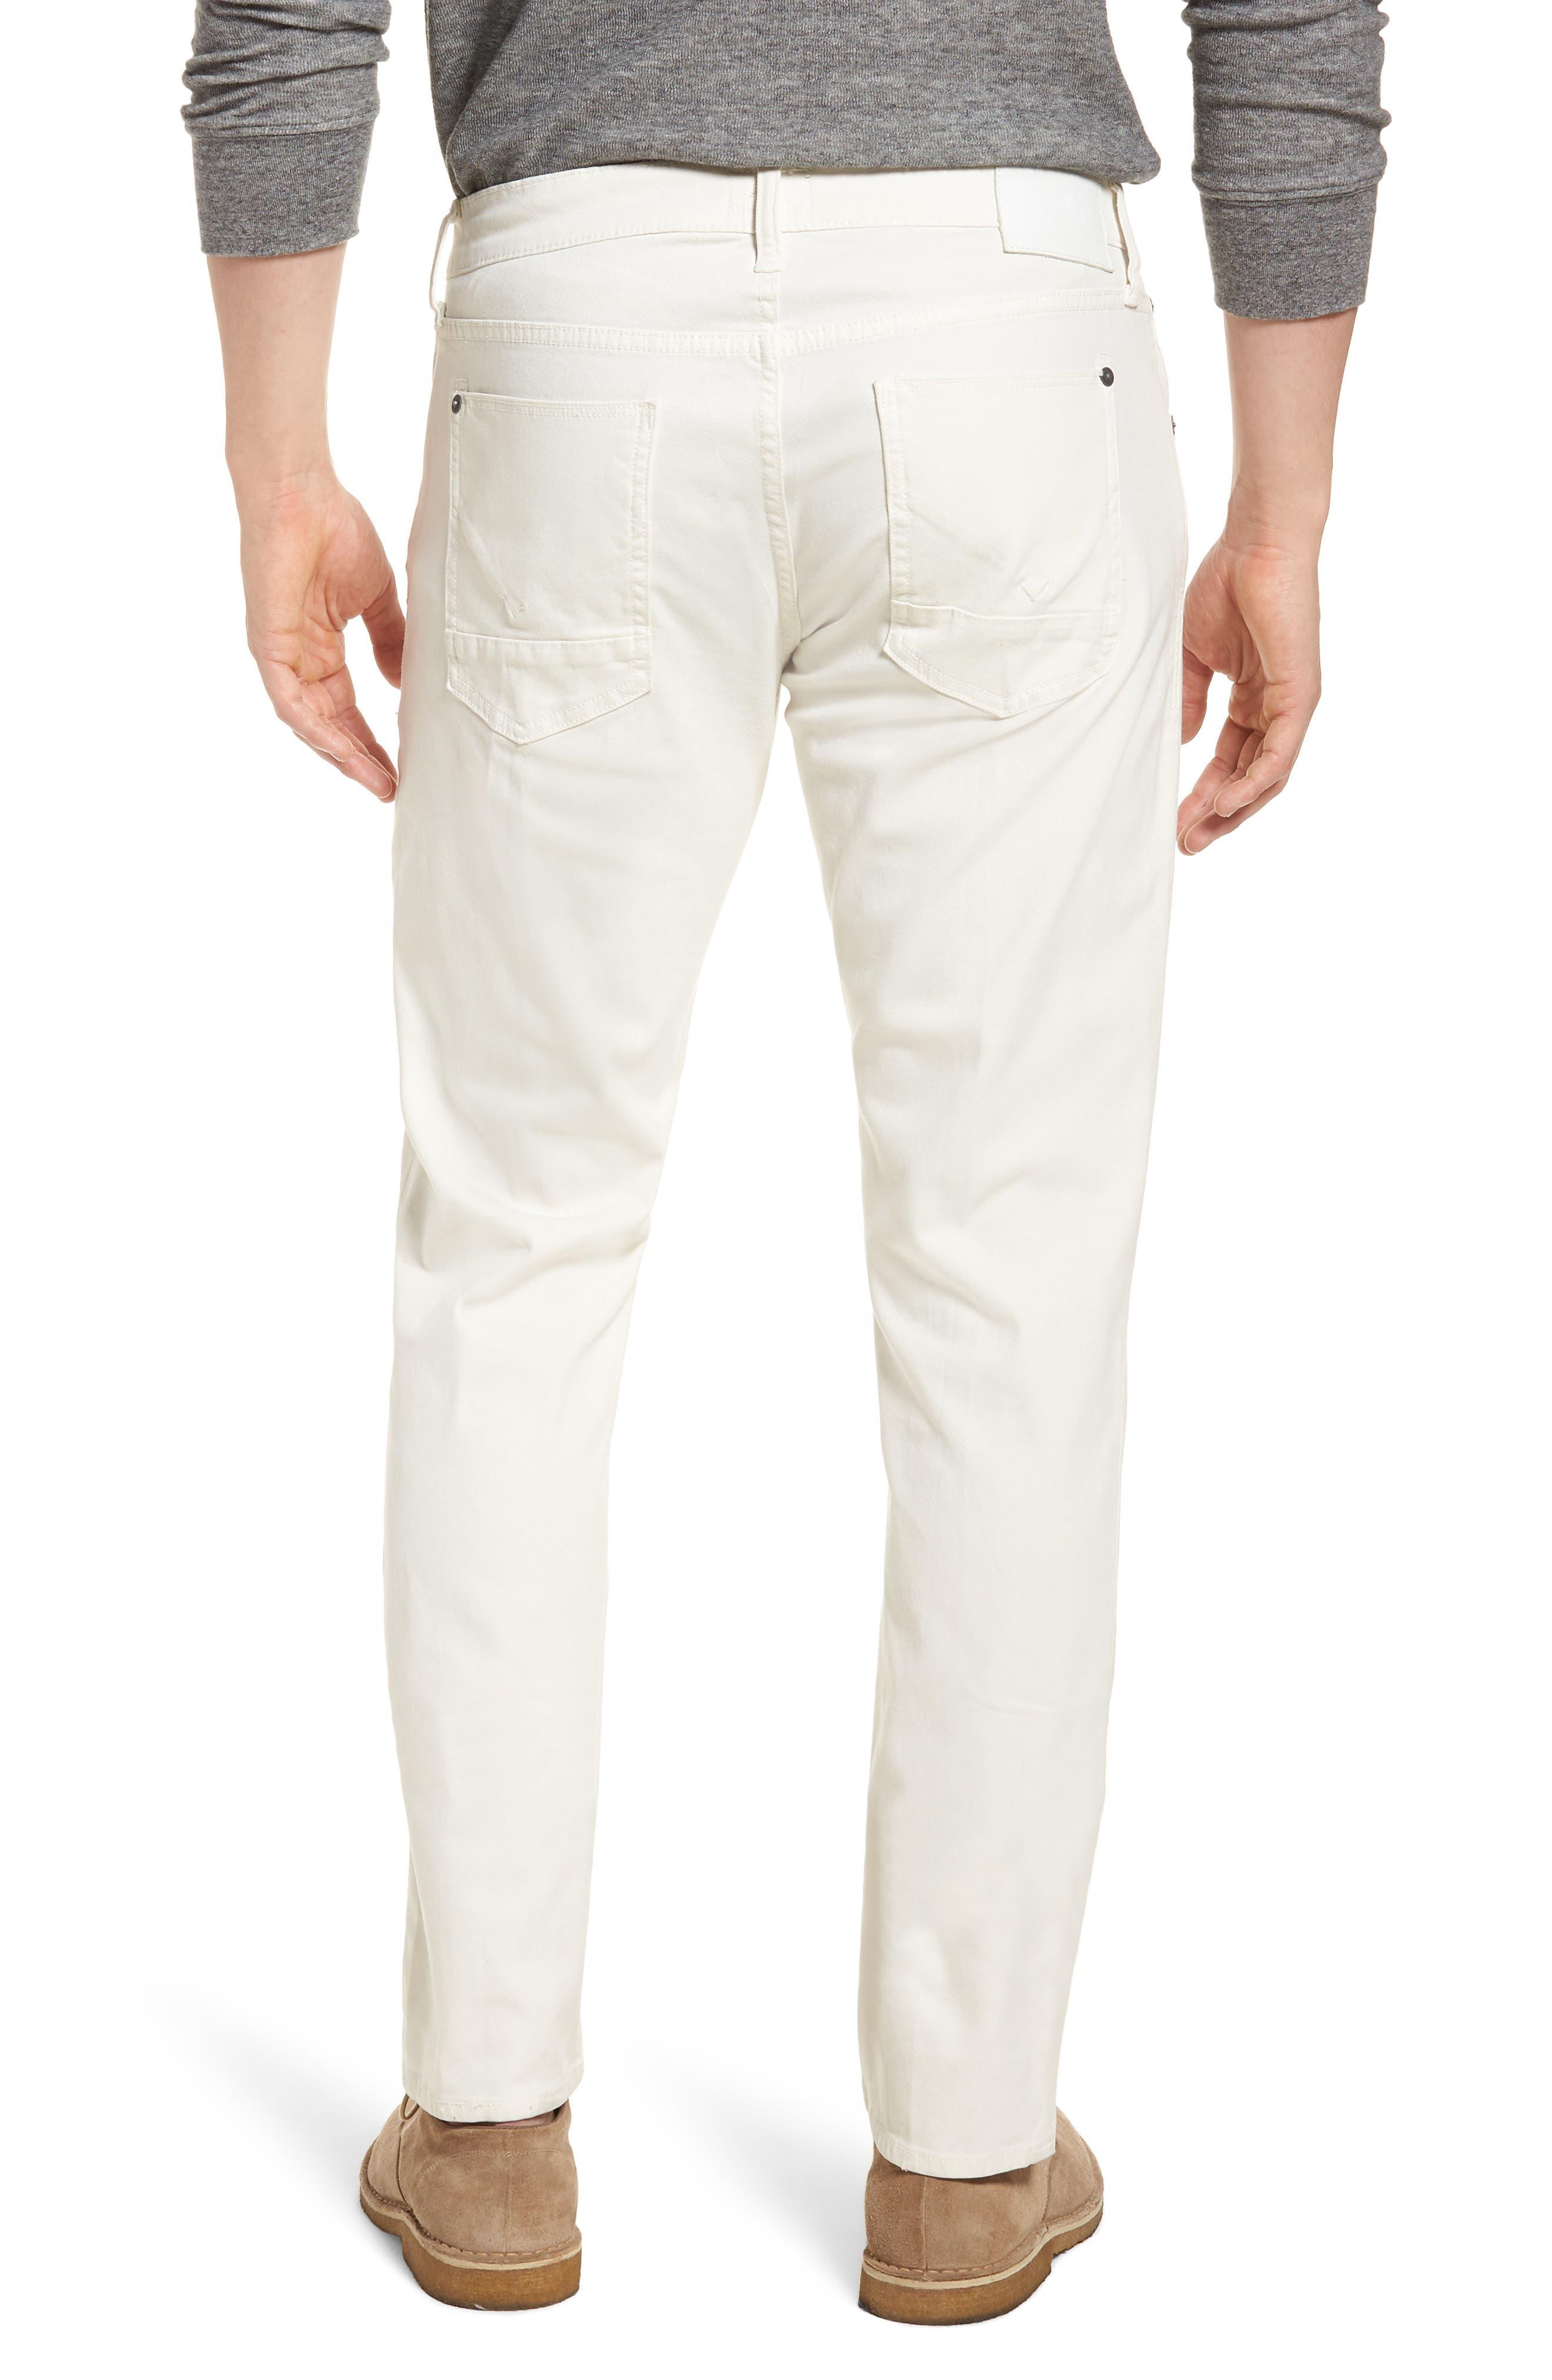 Blake Slim Fit Jeans,                             Alternate thumbnail 2, color,                             110